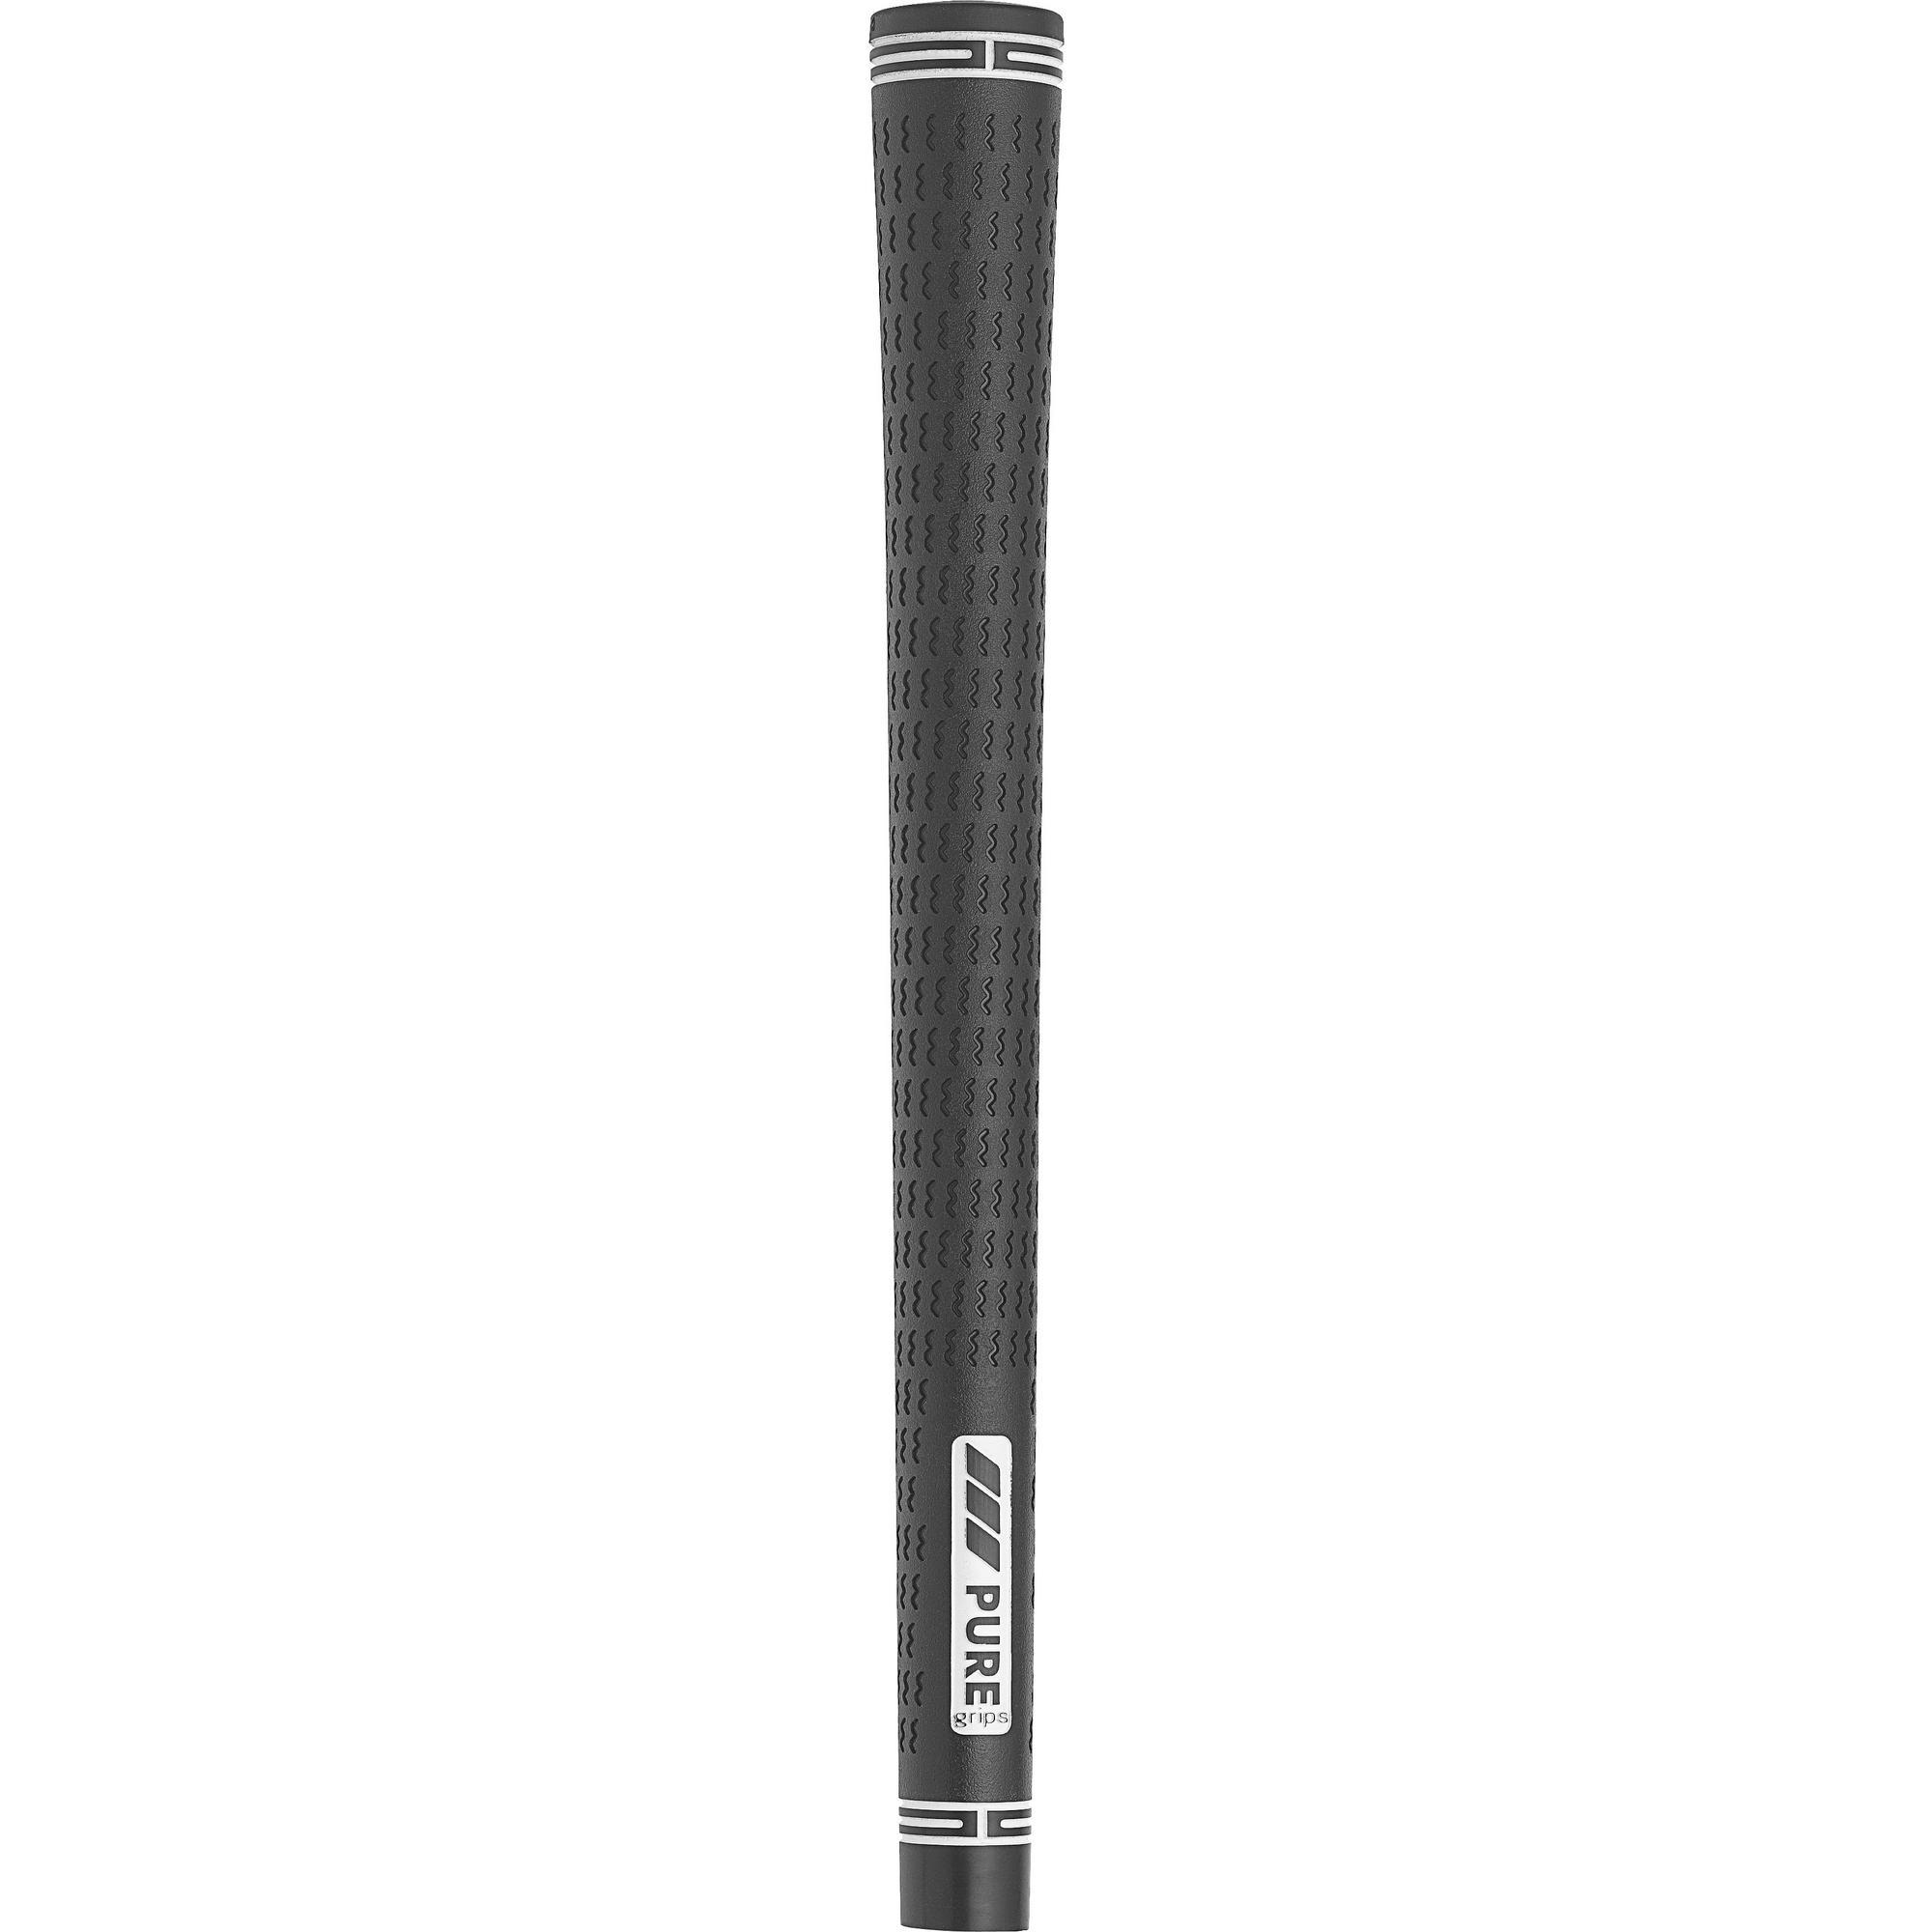 Poignée Pro Standard .600